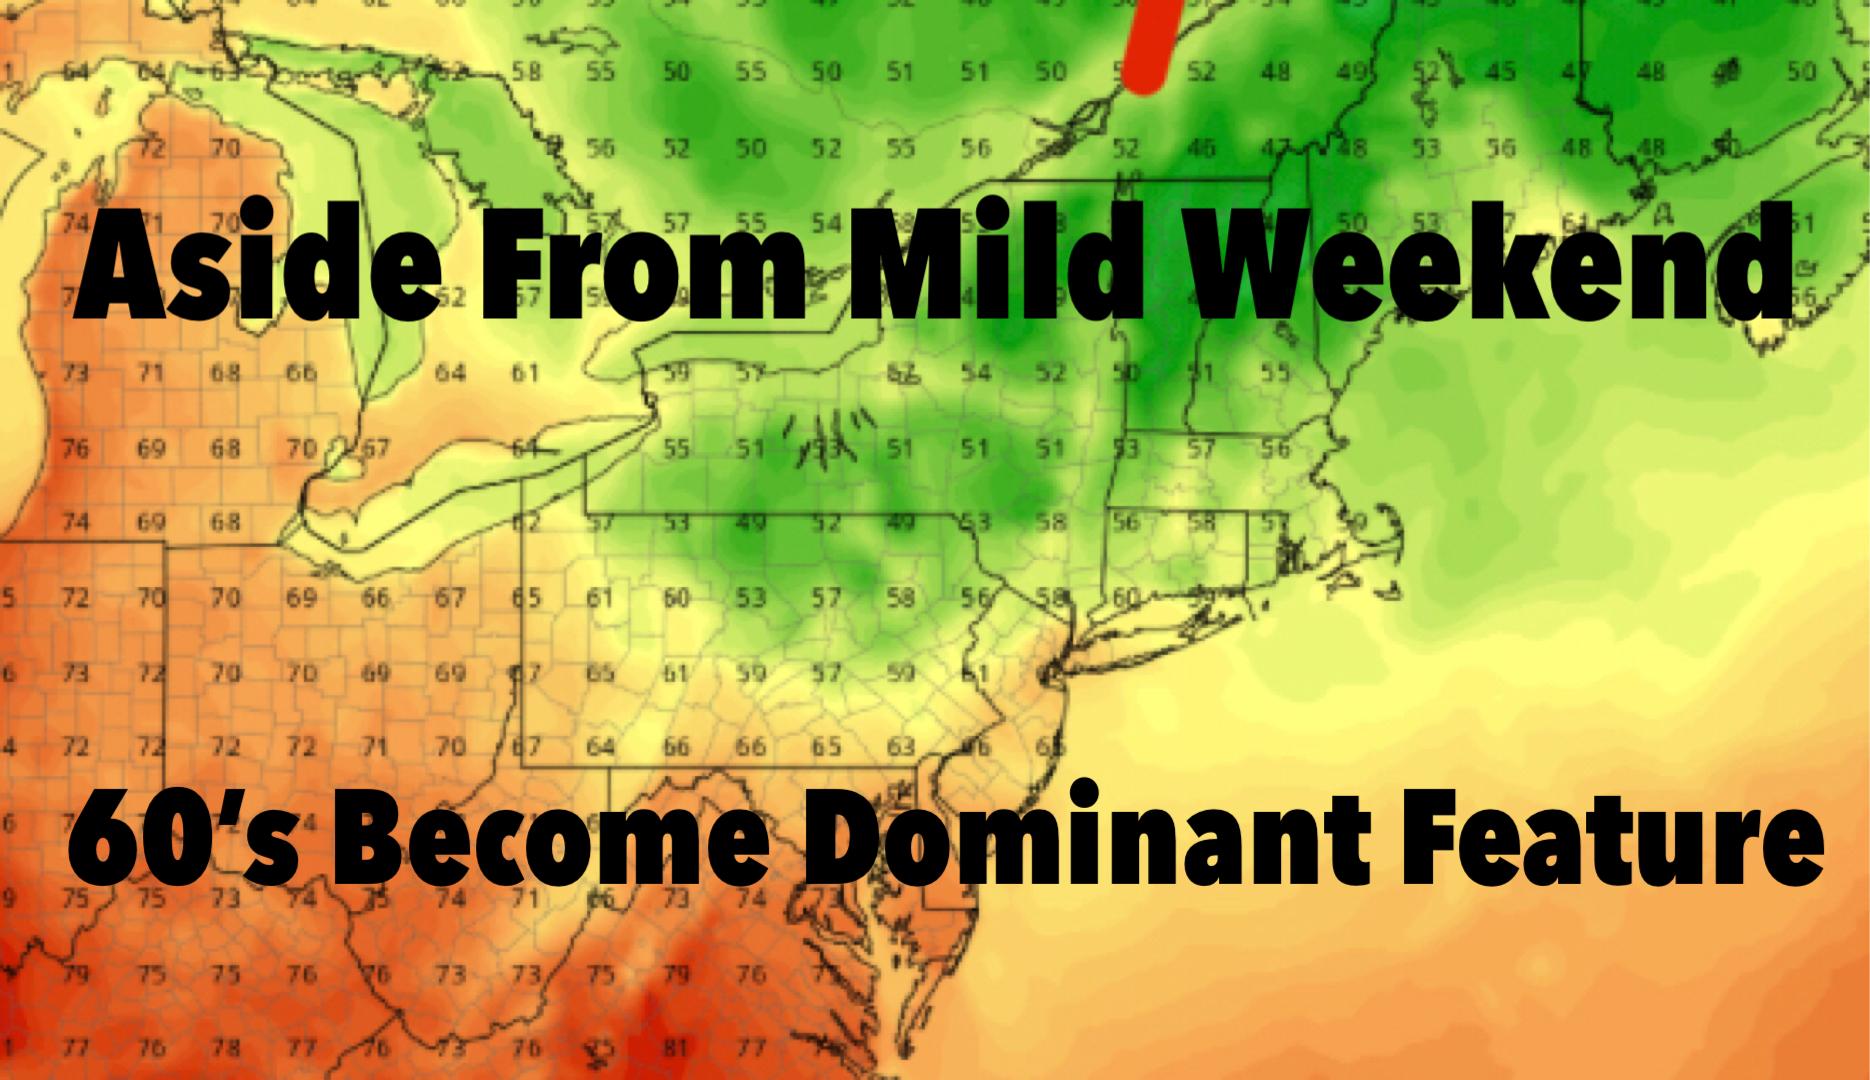 NYC Seasonal Temperatures Dominate Forecast